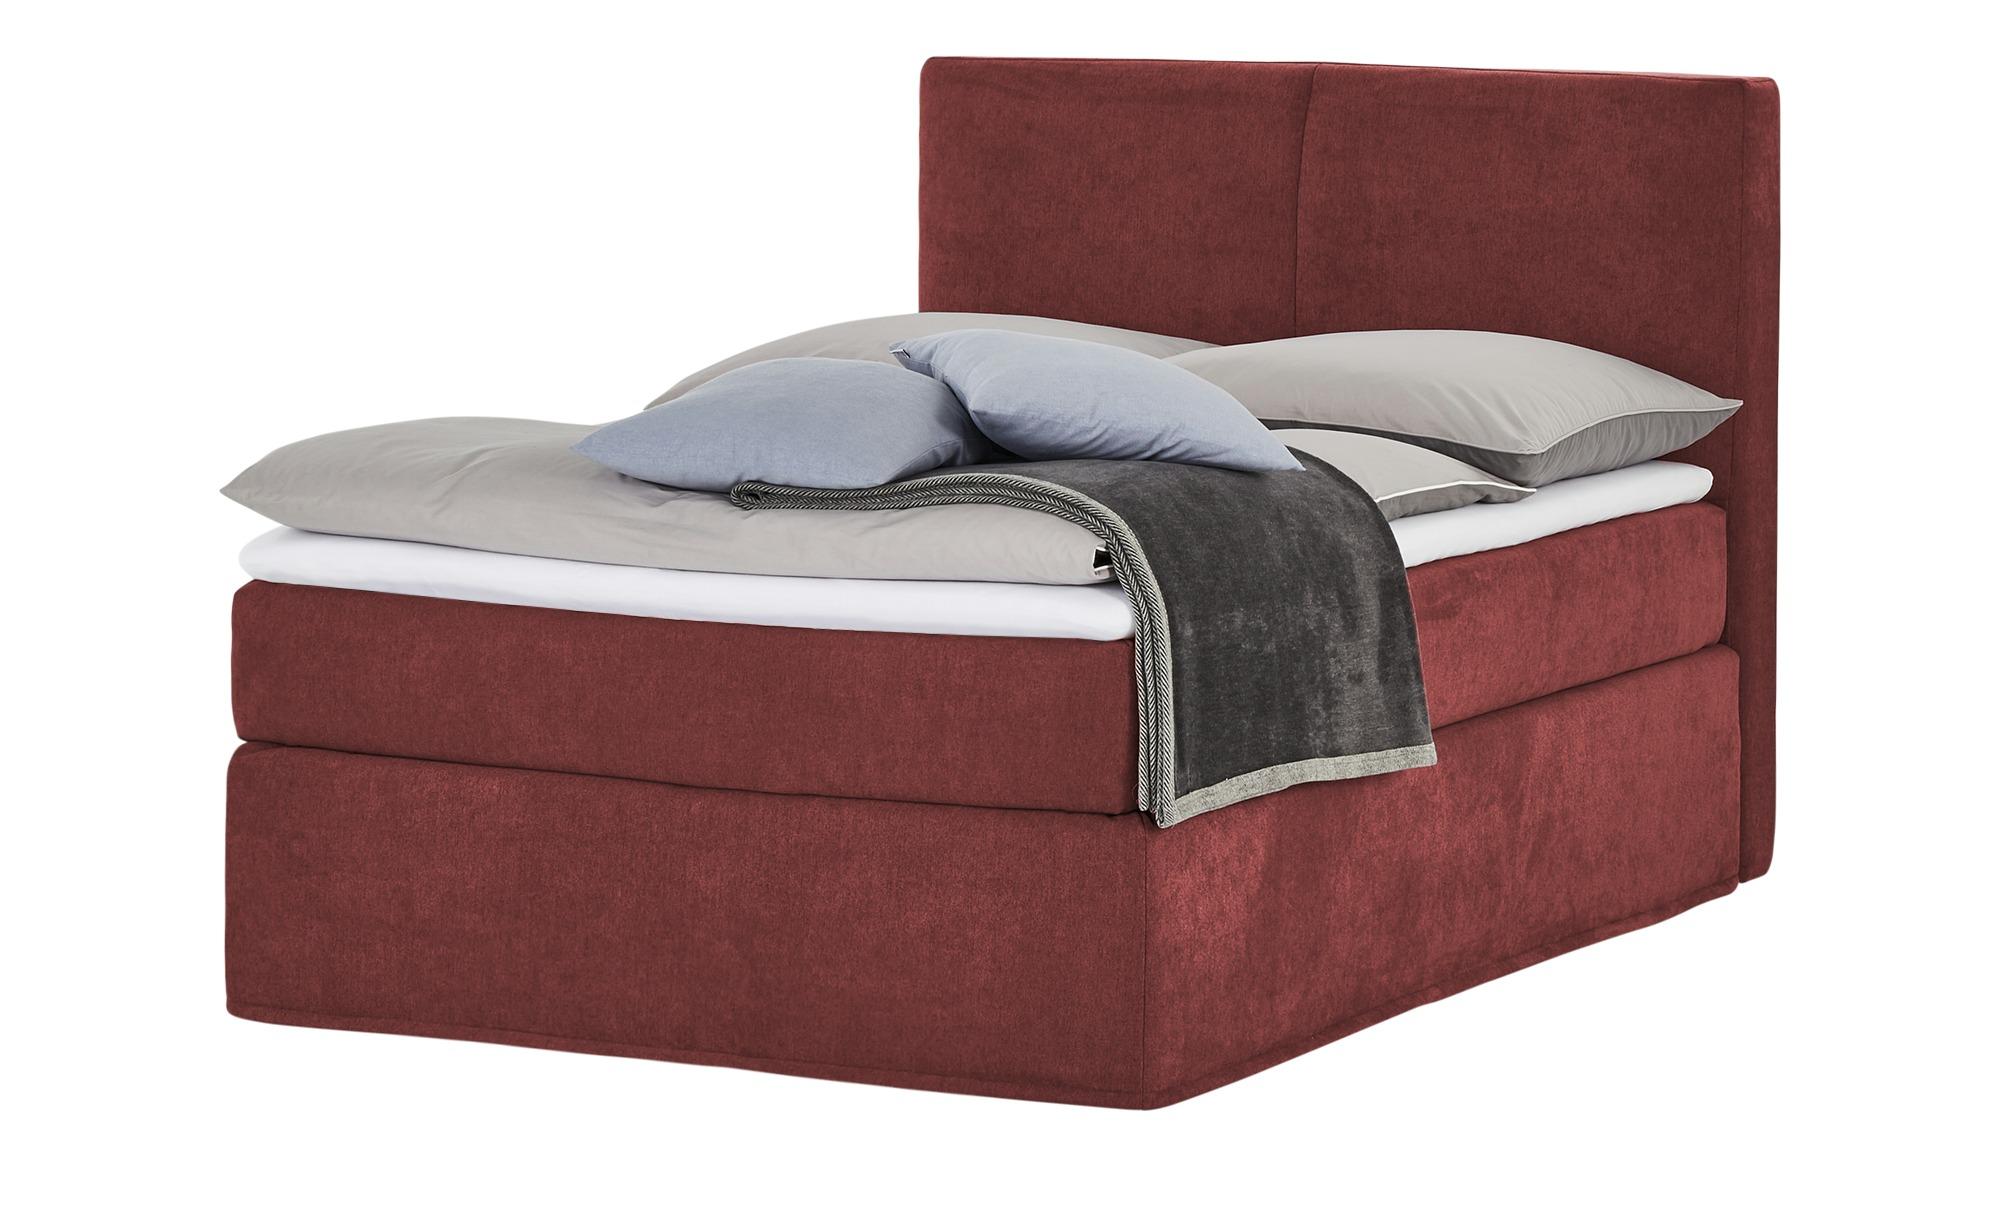 Boxi Boxspringbett 140 x 200 cm  Boxi Classic ¦ rot Betten > Boxspringbette günstig online kaufen